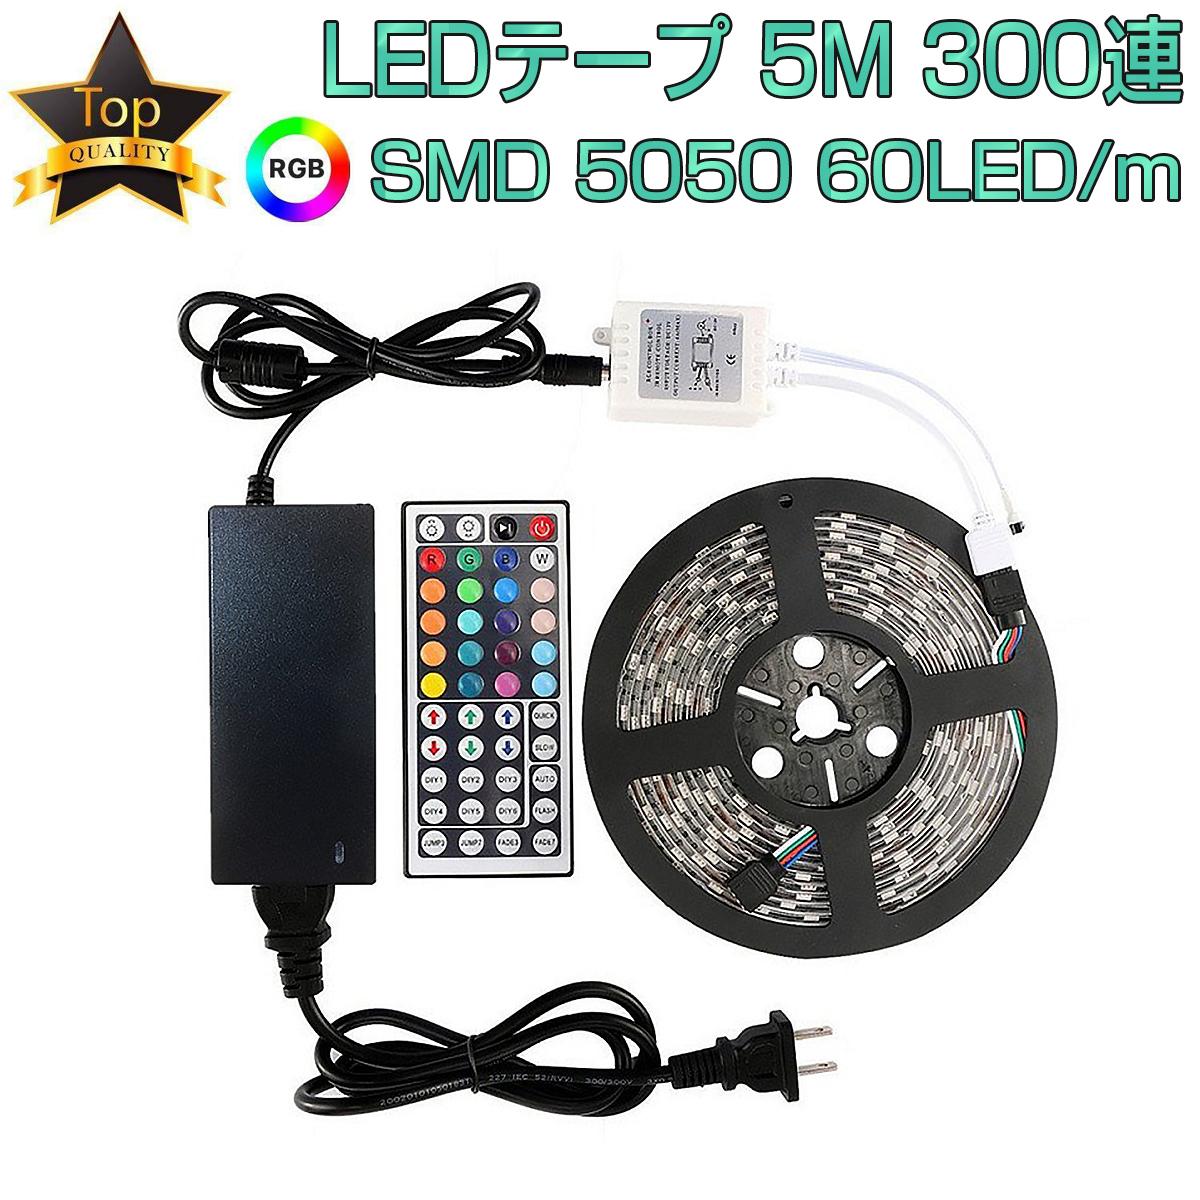 RGB LEDテープ SMD5050 5m 300連 20色 調光 リモコン 防水 高輝度 テープLED カット可能 1mにつき60LED 12V SDM便送料無料 1ヶ月保証 K&M